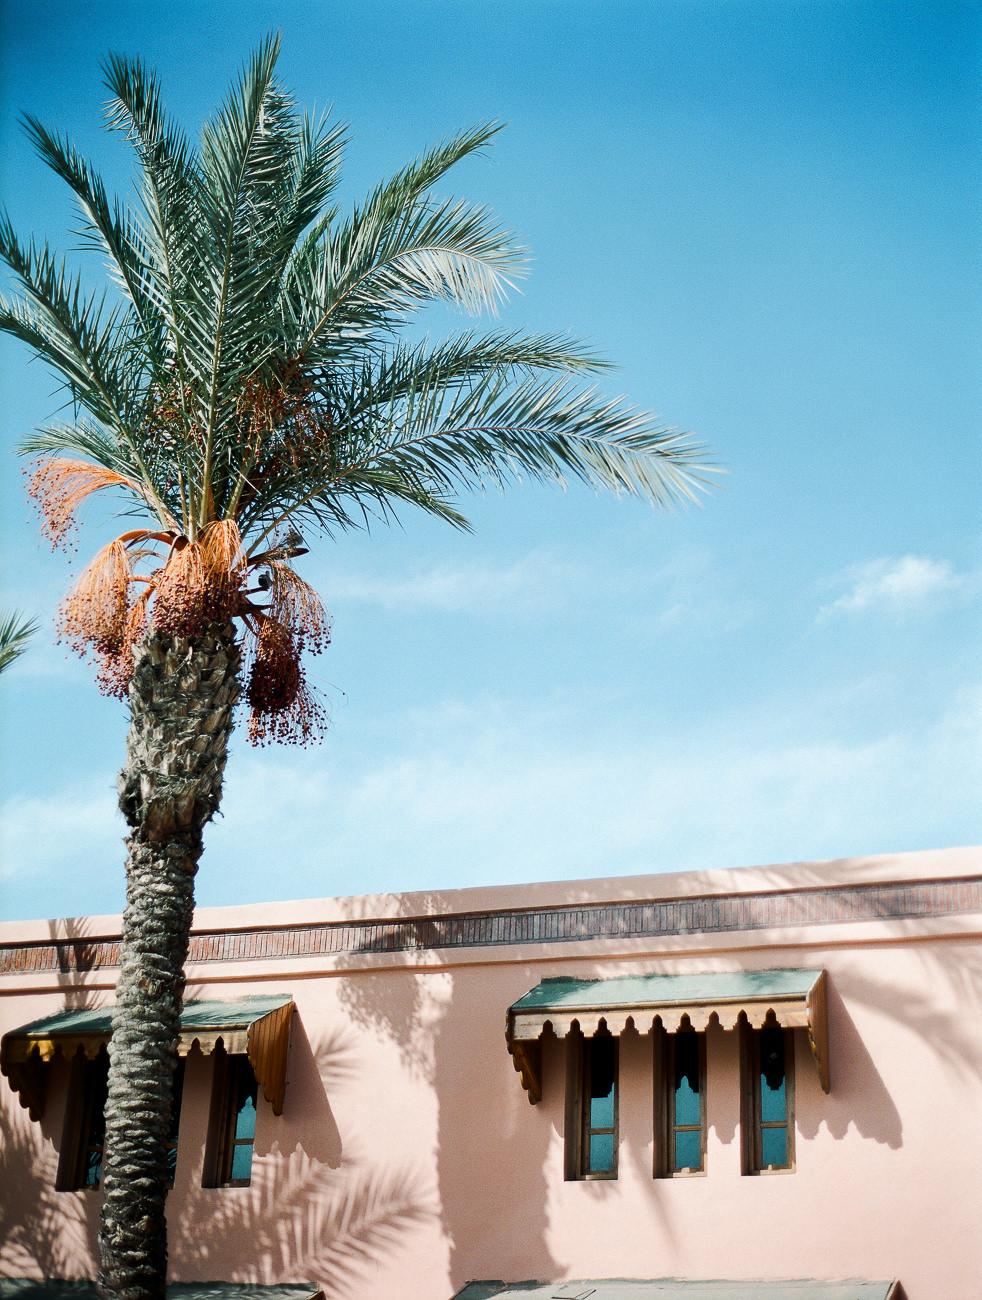 marrakech-photographe-voyage-alain-m-2.jpg